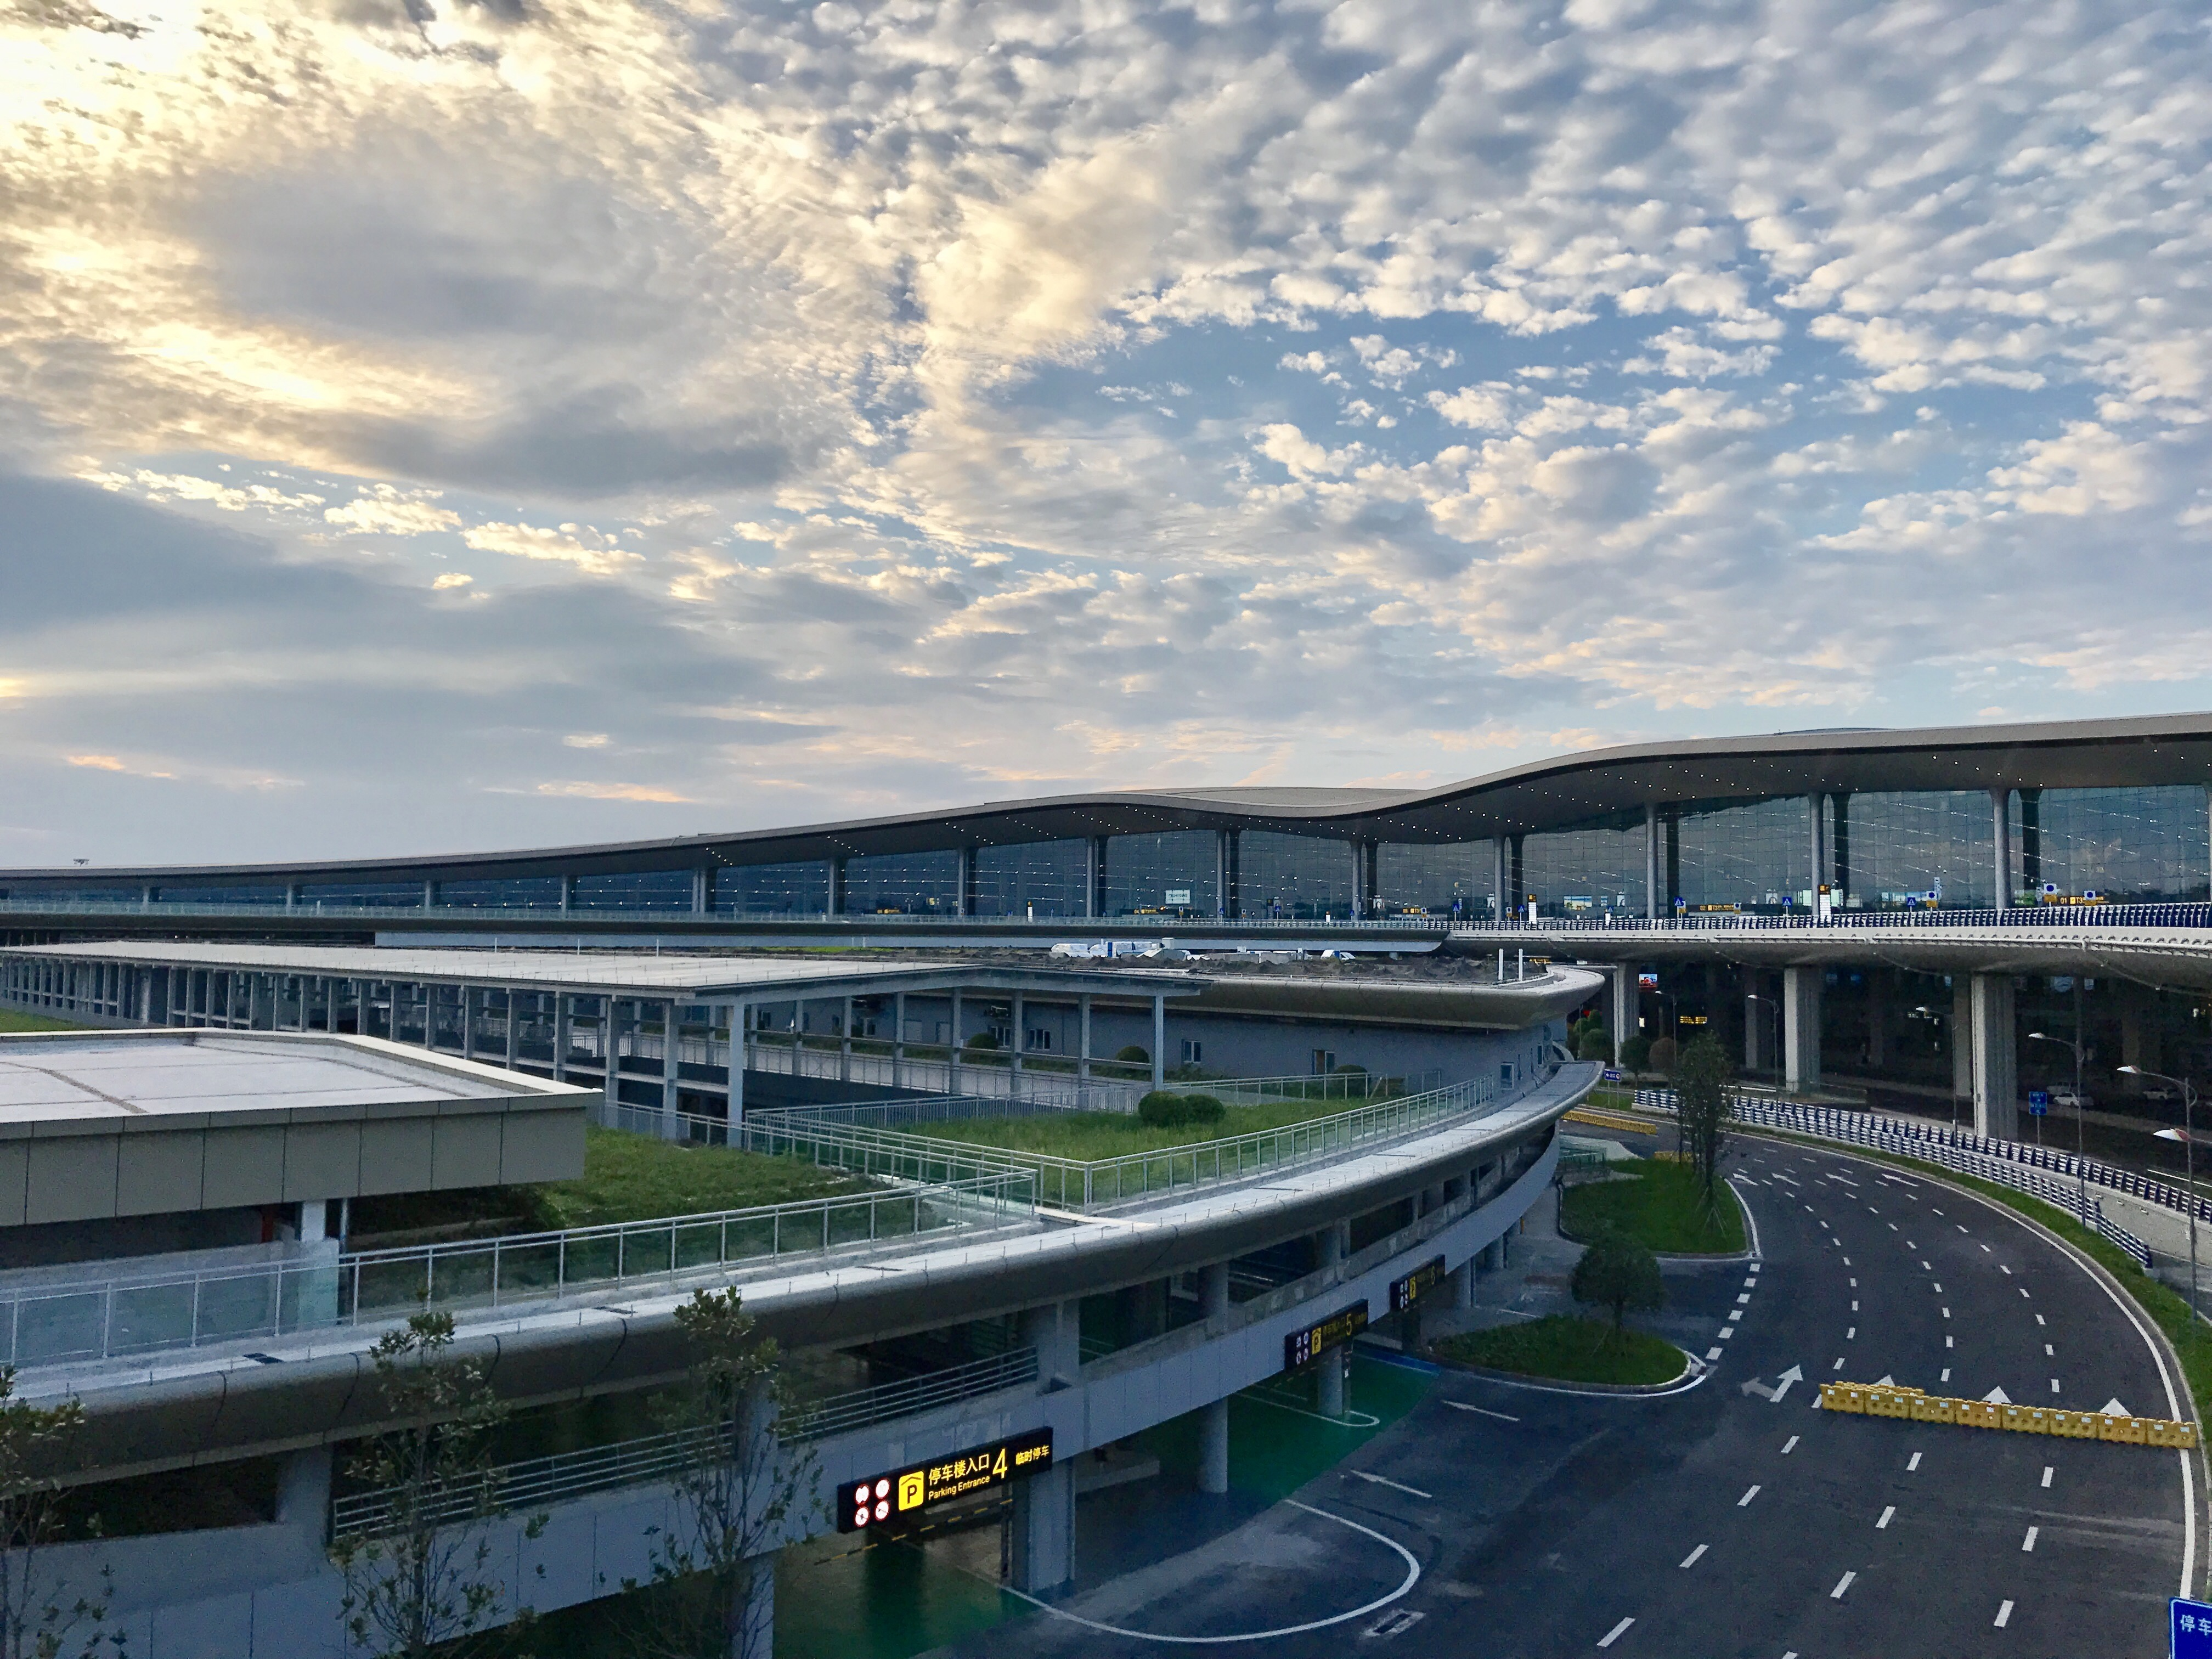 Chongqing Jiangbei International Airport - Wikipedia